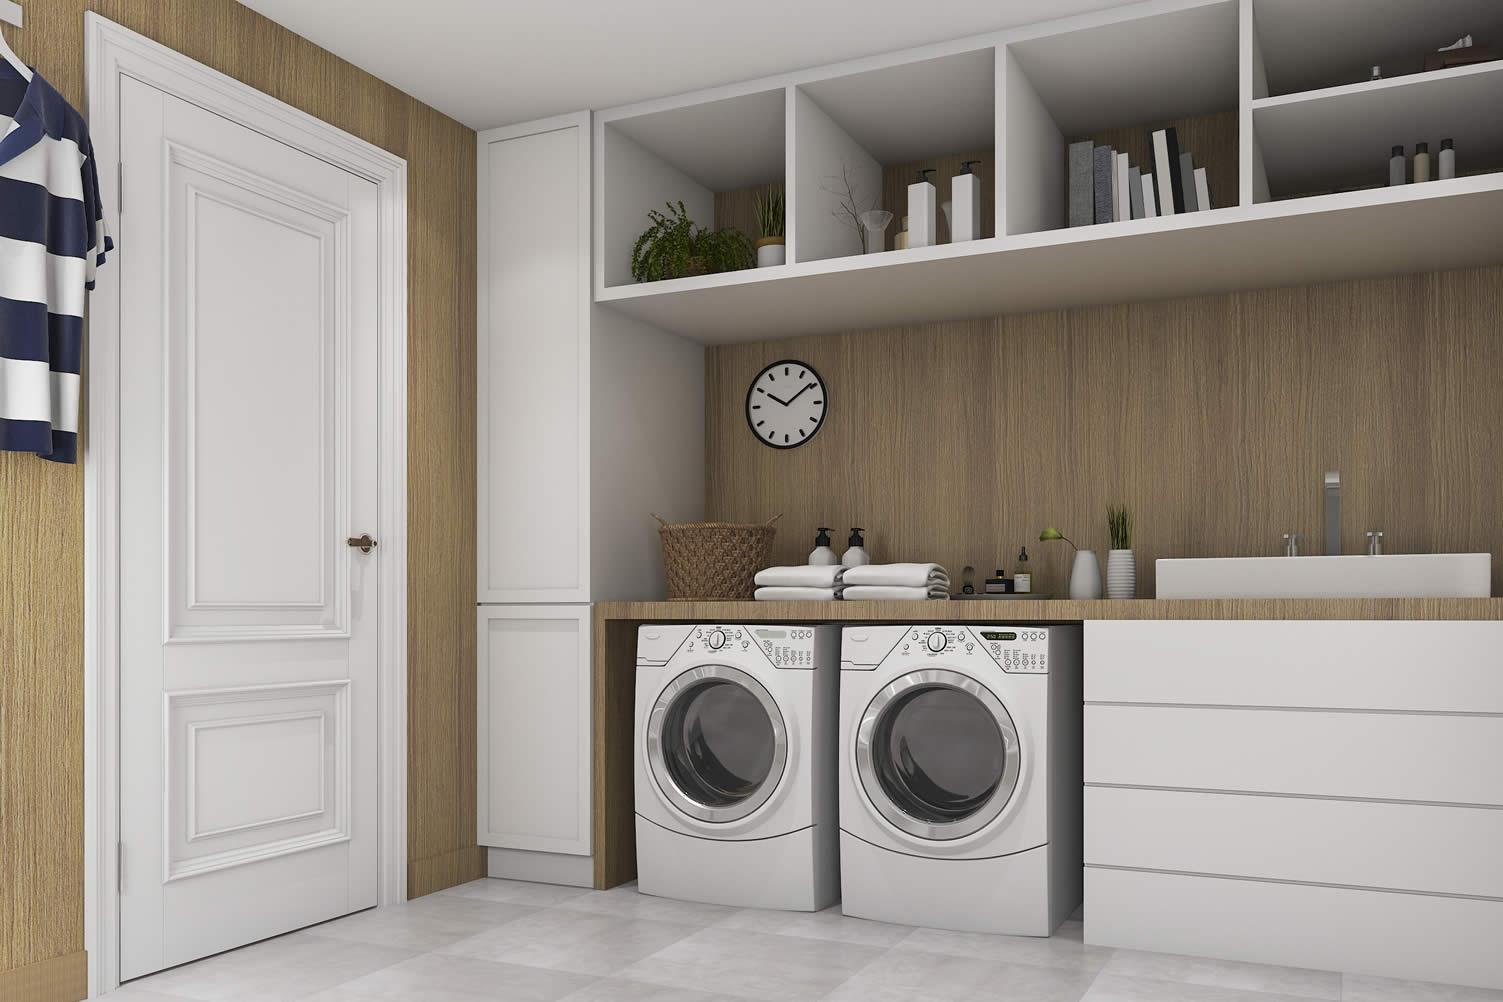 renovating laundry room